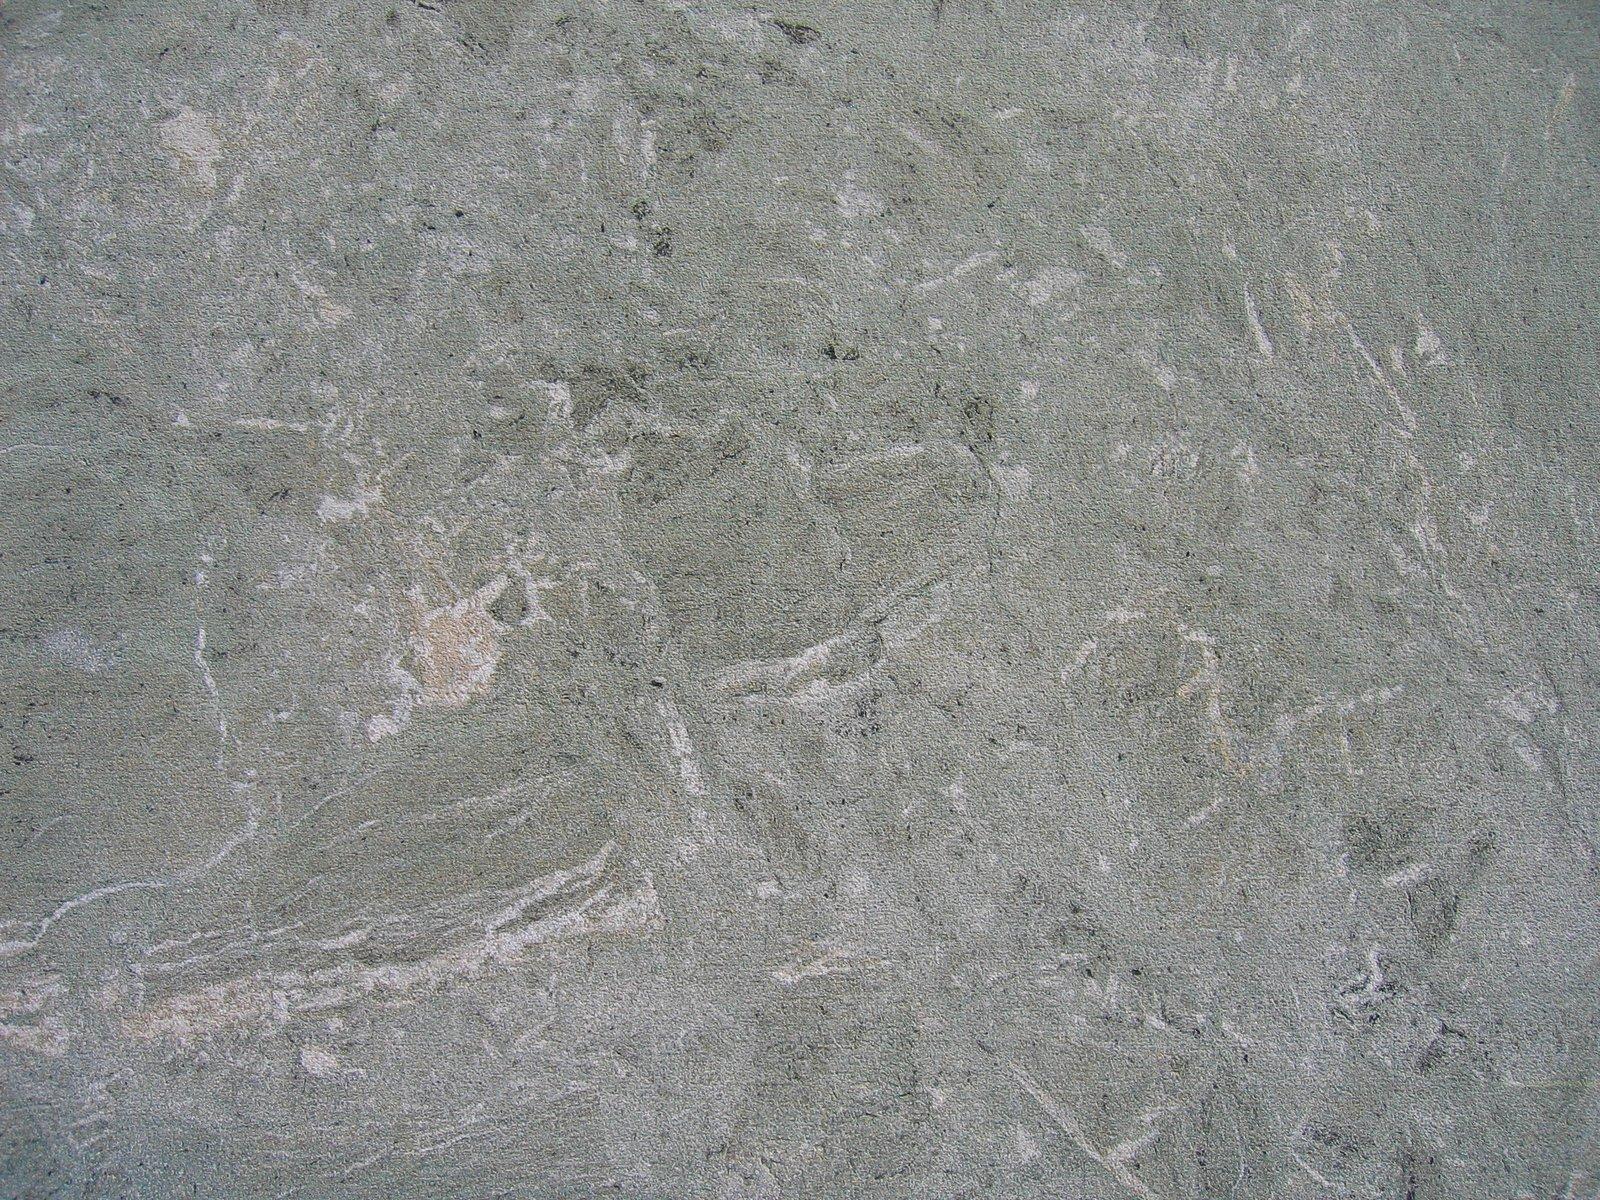 Desktop Wallpaper Fall Flowers Pastel Green Marble Texture Photo 1145862 Freeimages Com